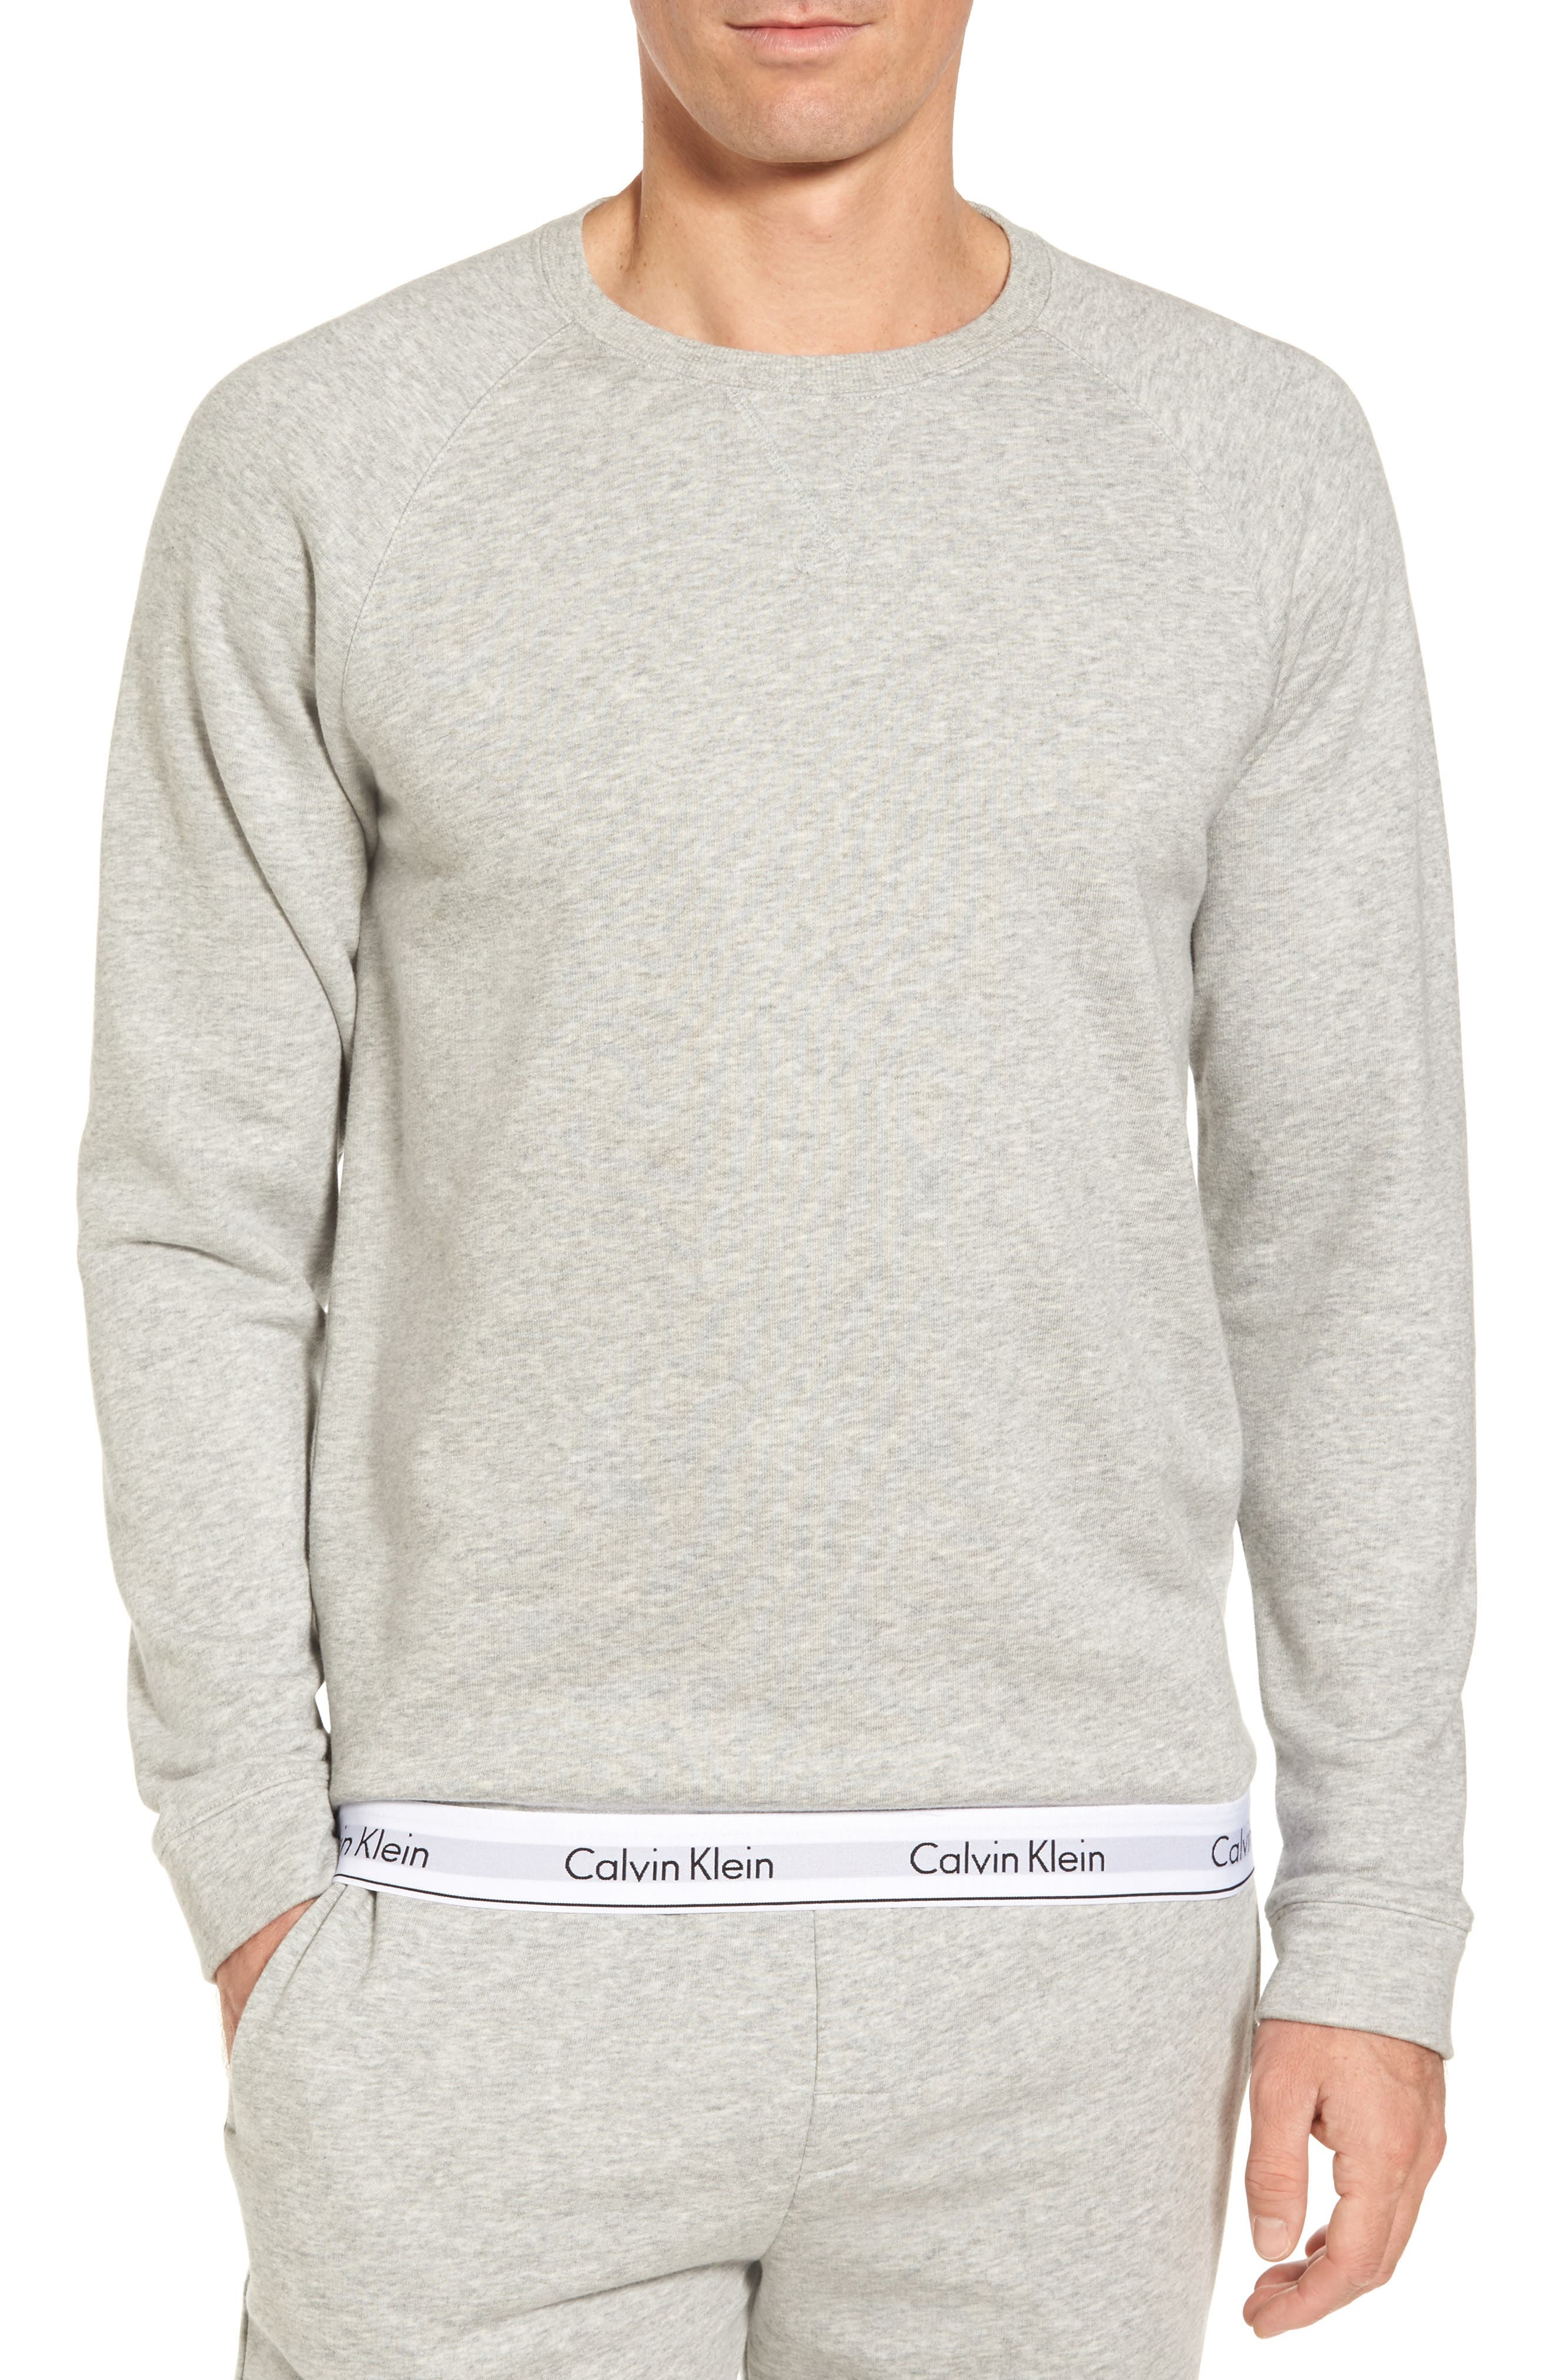 Calvin Klein Lounge Crewneck Sweatshirt